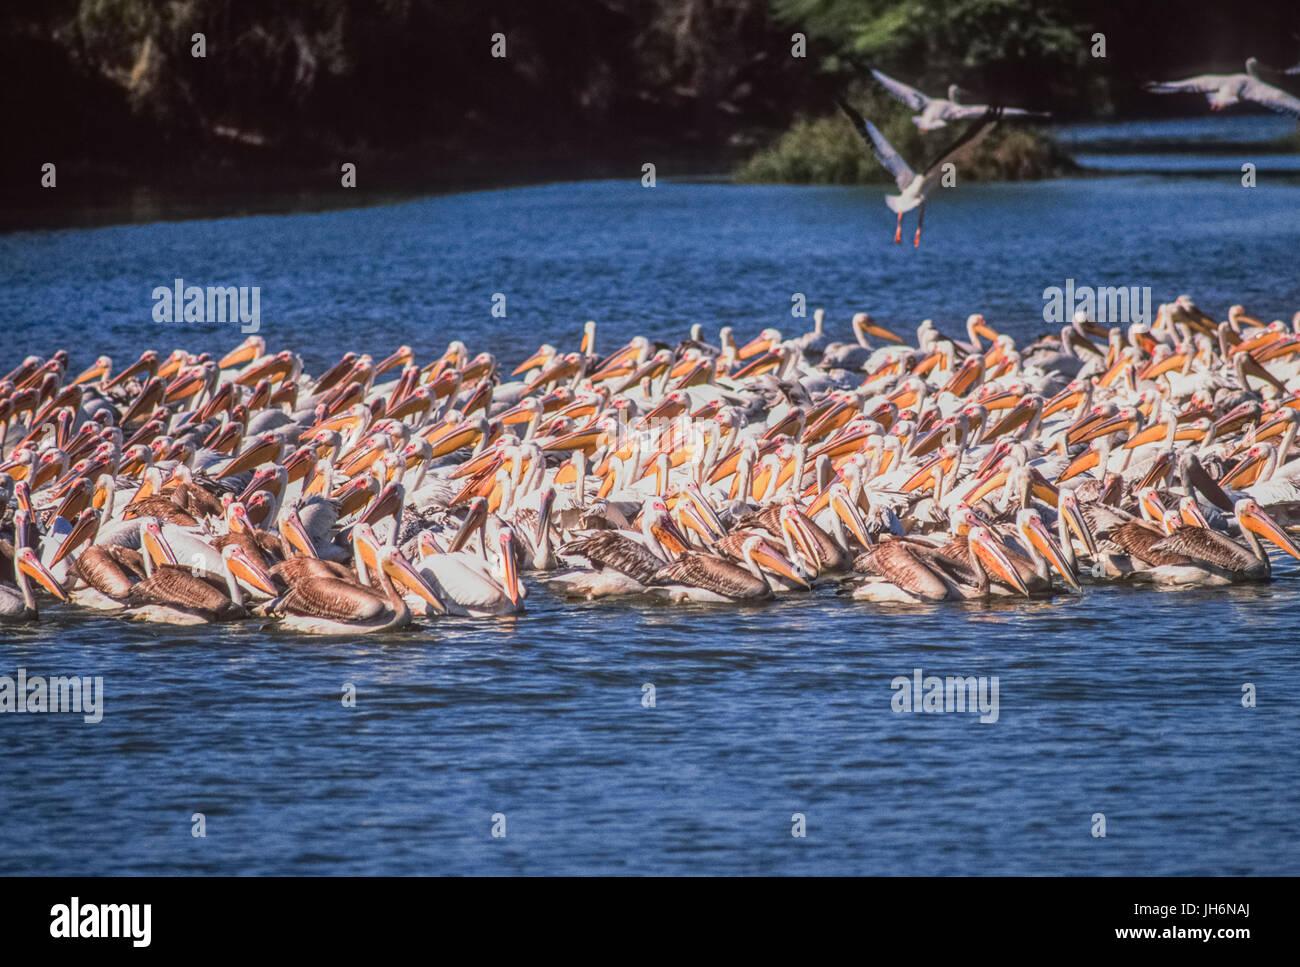 Great White Pelican or Rosy Pelican or White Pelican, (Pelecanus onocrotalus), Keoladeo Ghana National Park, Bharatpur, - Stock Image